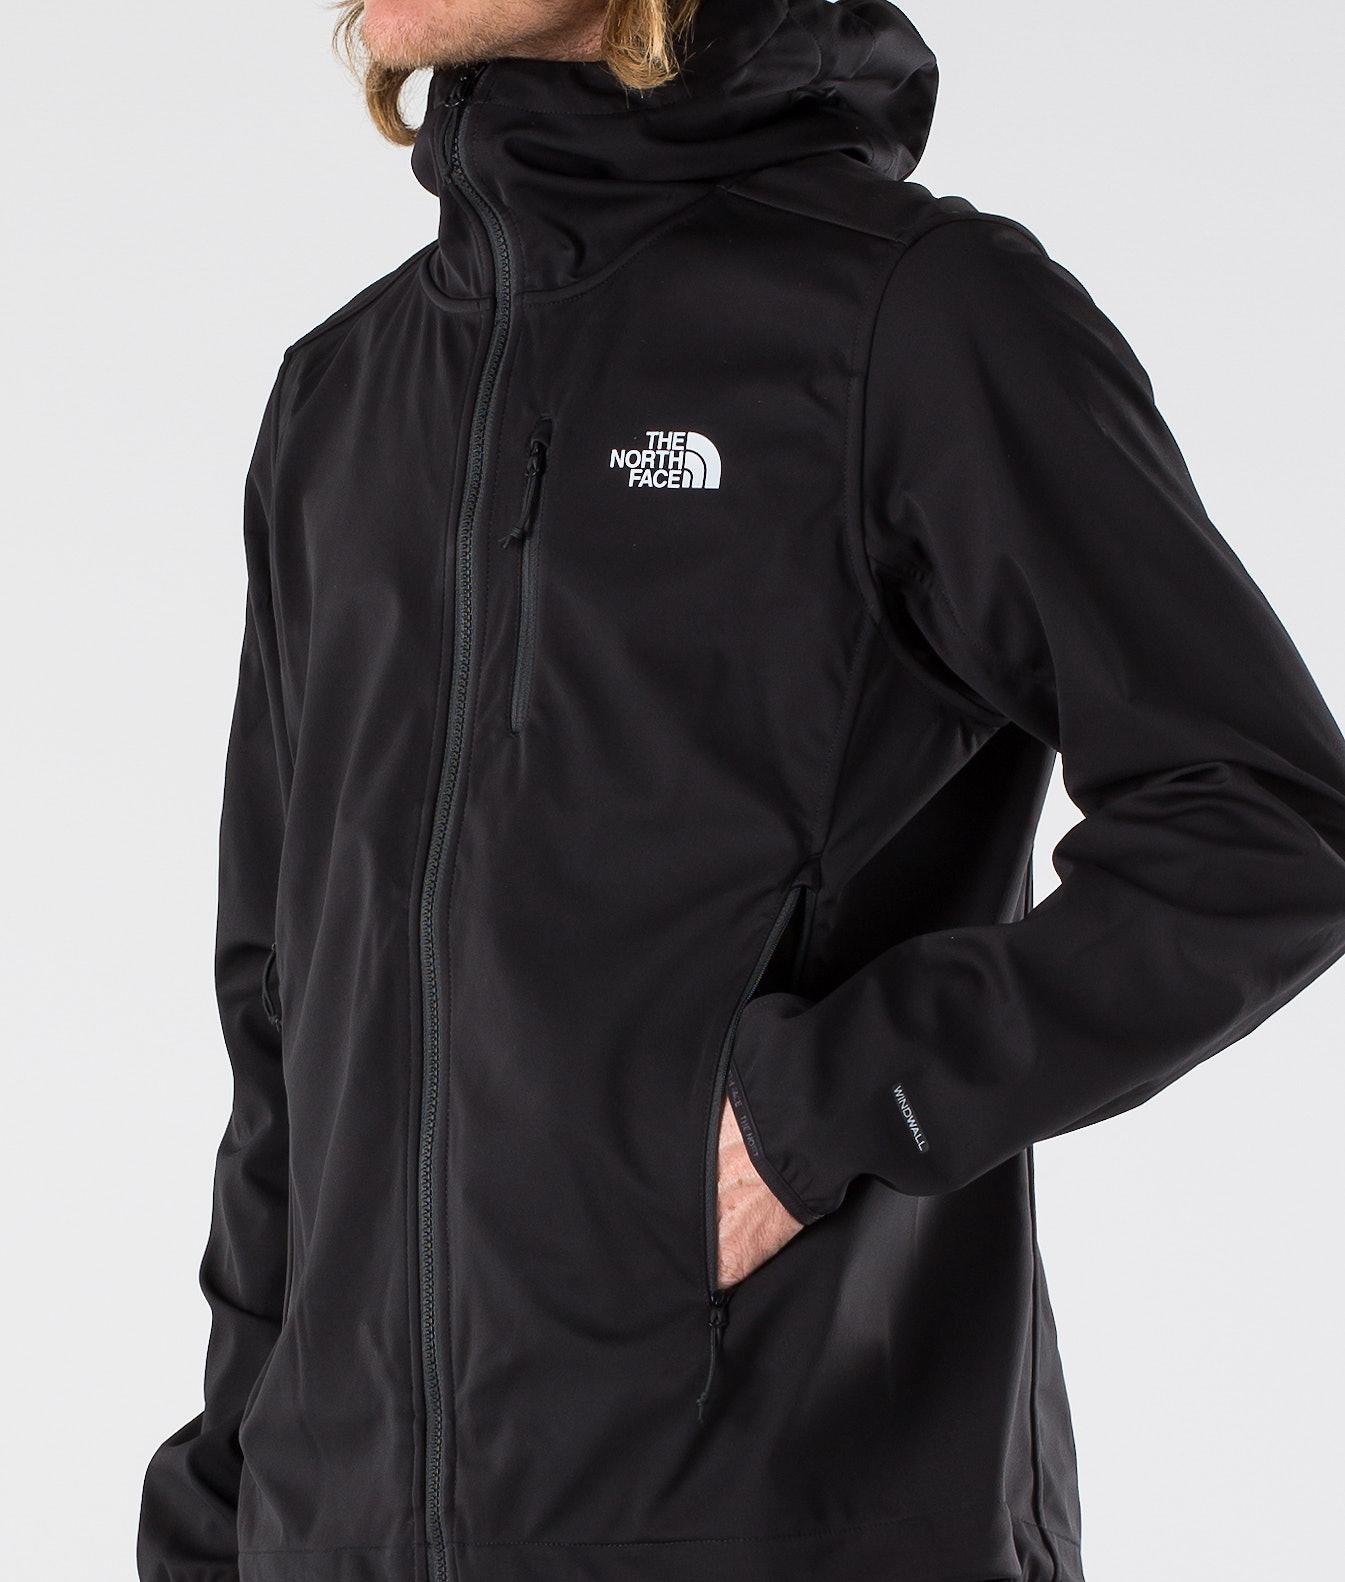 648349b6f The North Face Tansa Softshell Outdoor Jacket Tnf Black